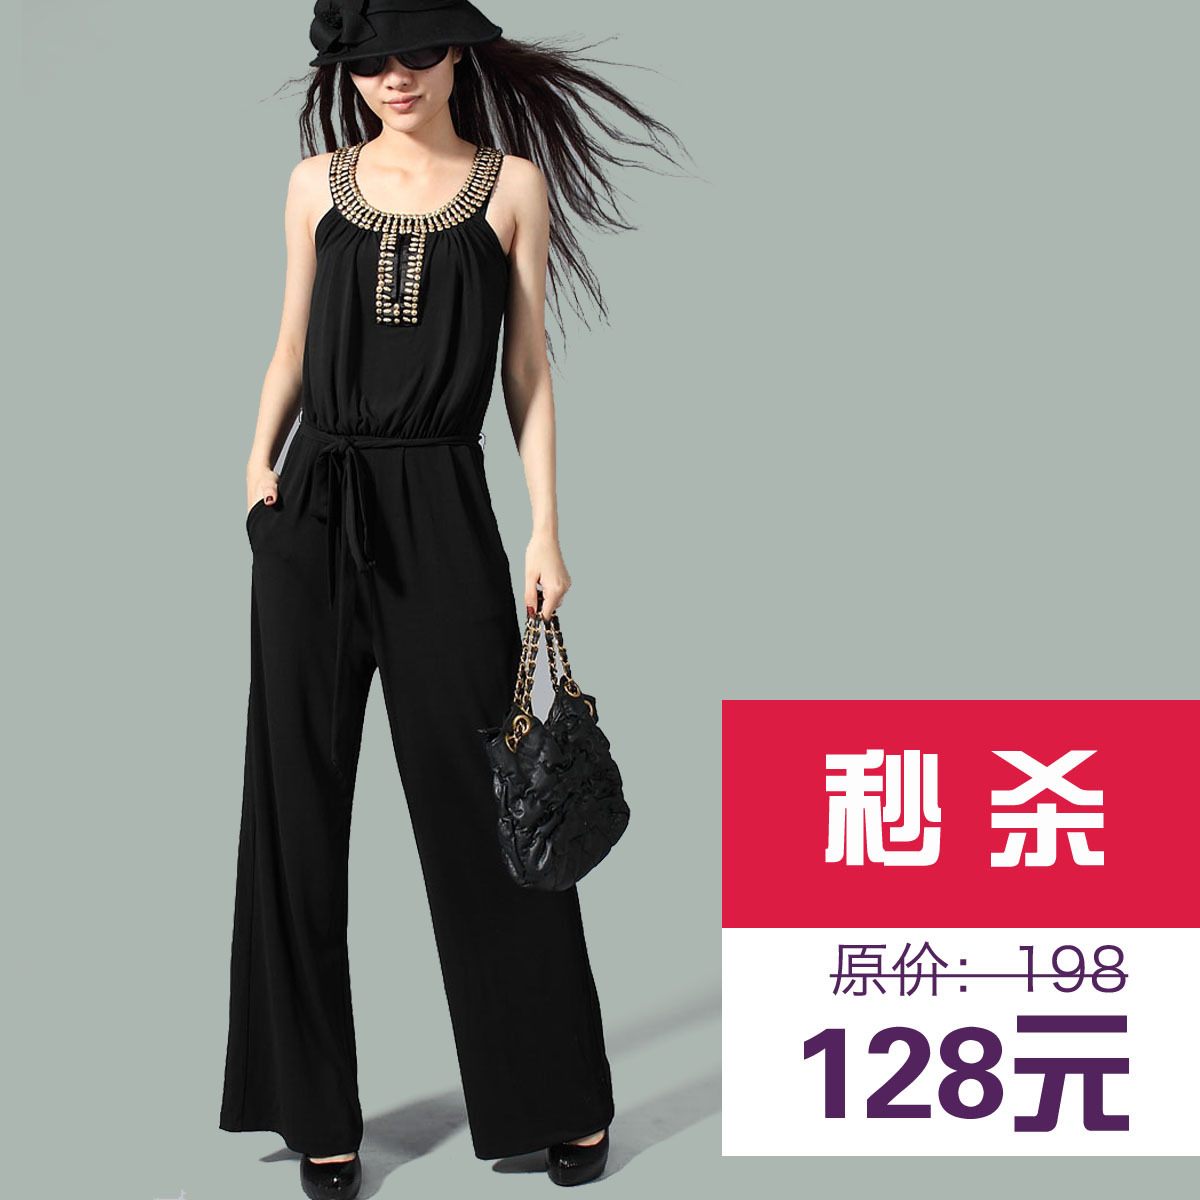 http://img04.taobaocdn.com/bao/uploaded/i4/T19i1BXhBPXXb4Ajk2_044545.jpg